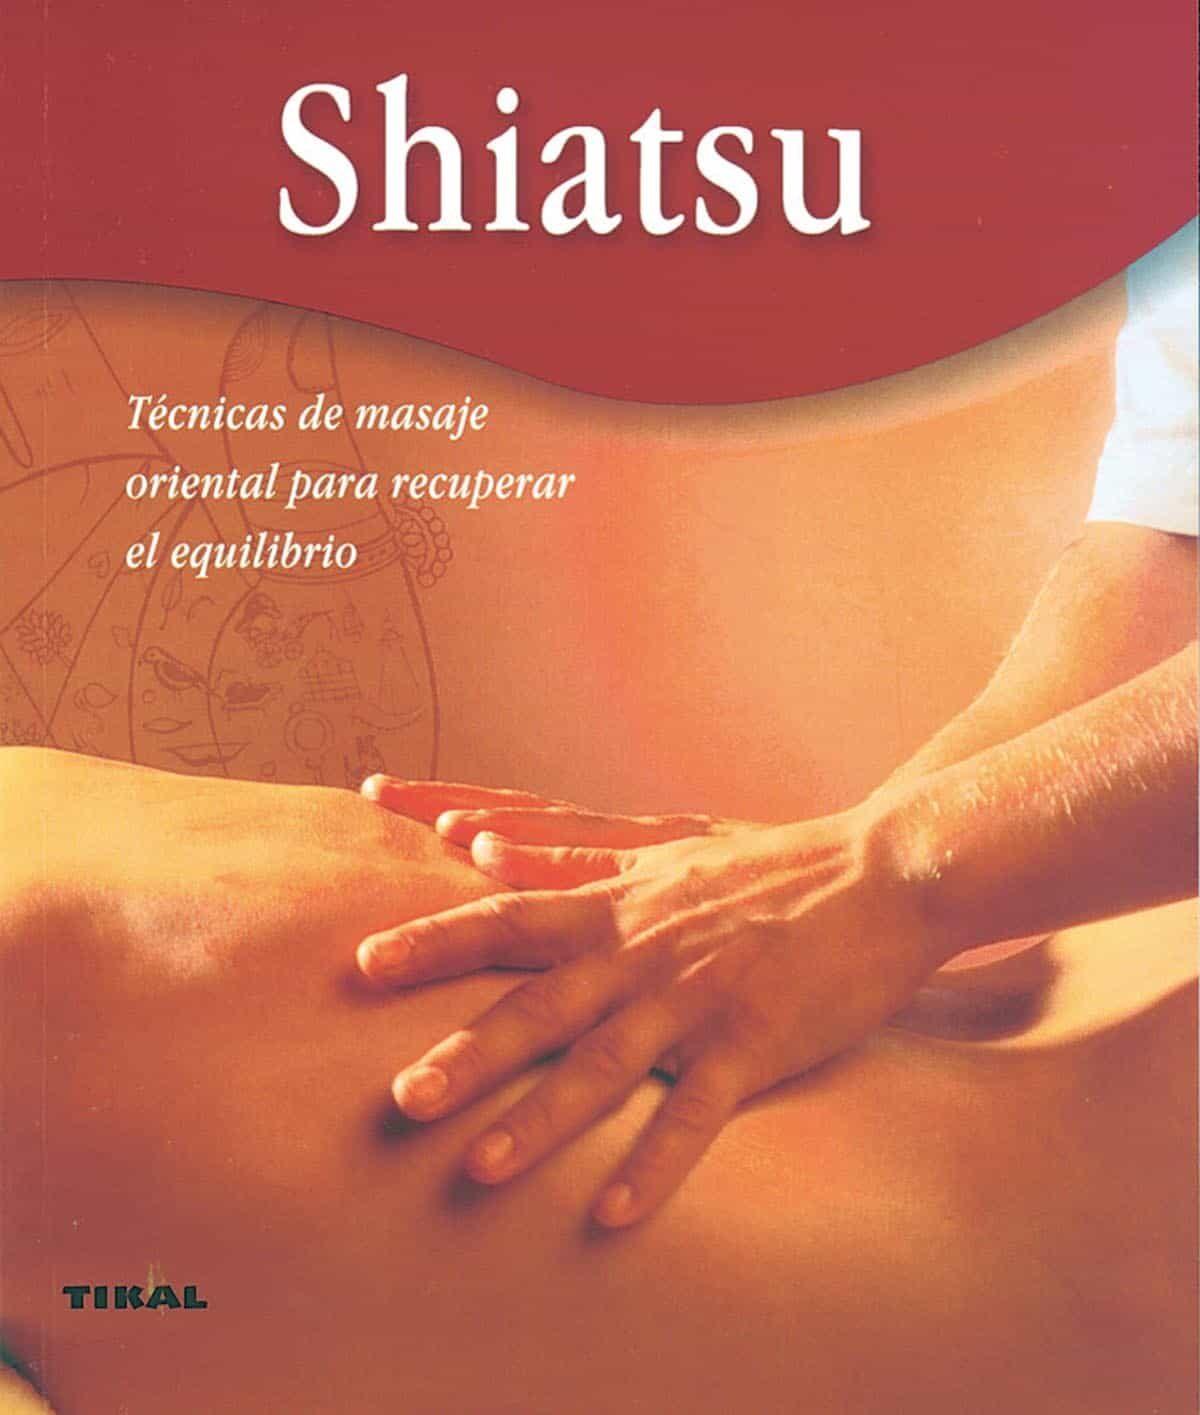 Shiatsu por Vv.aa. epub